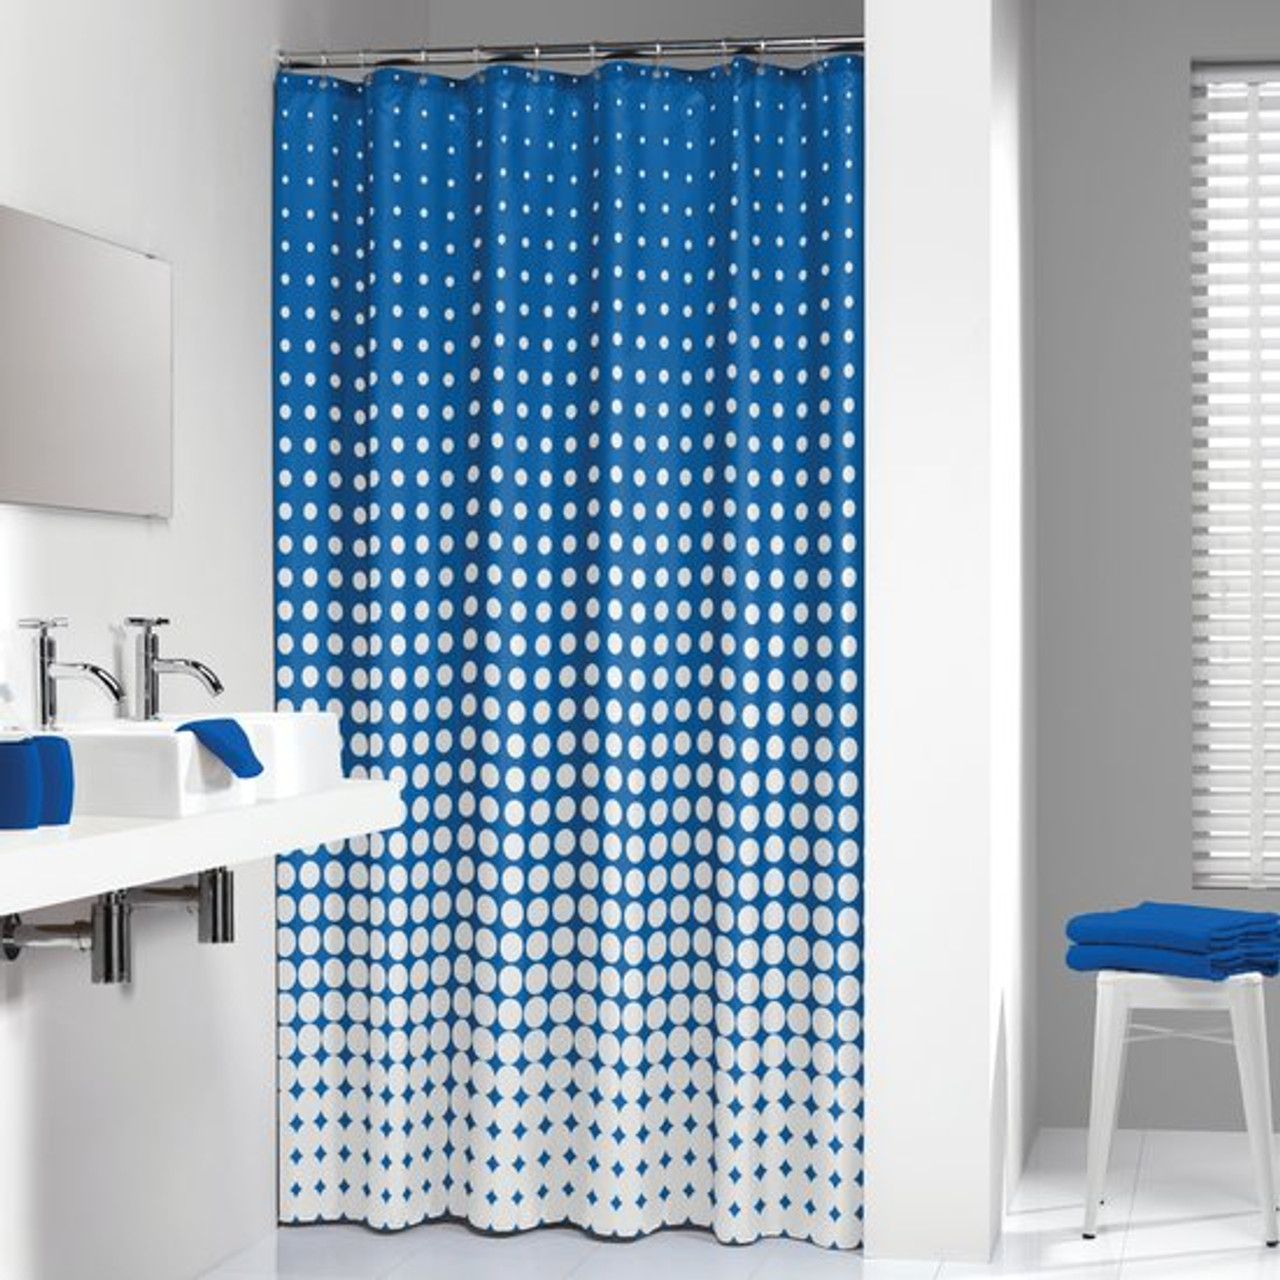 Shower Curtain Sealskin Speckles Blue Fabric